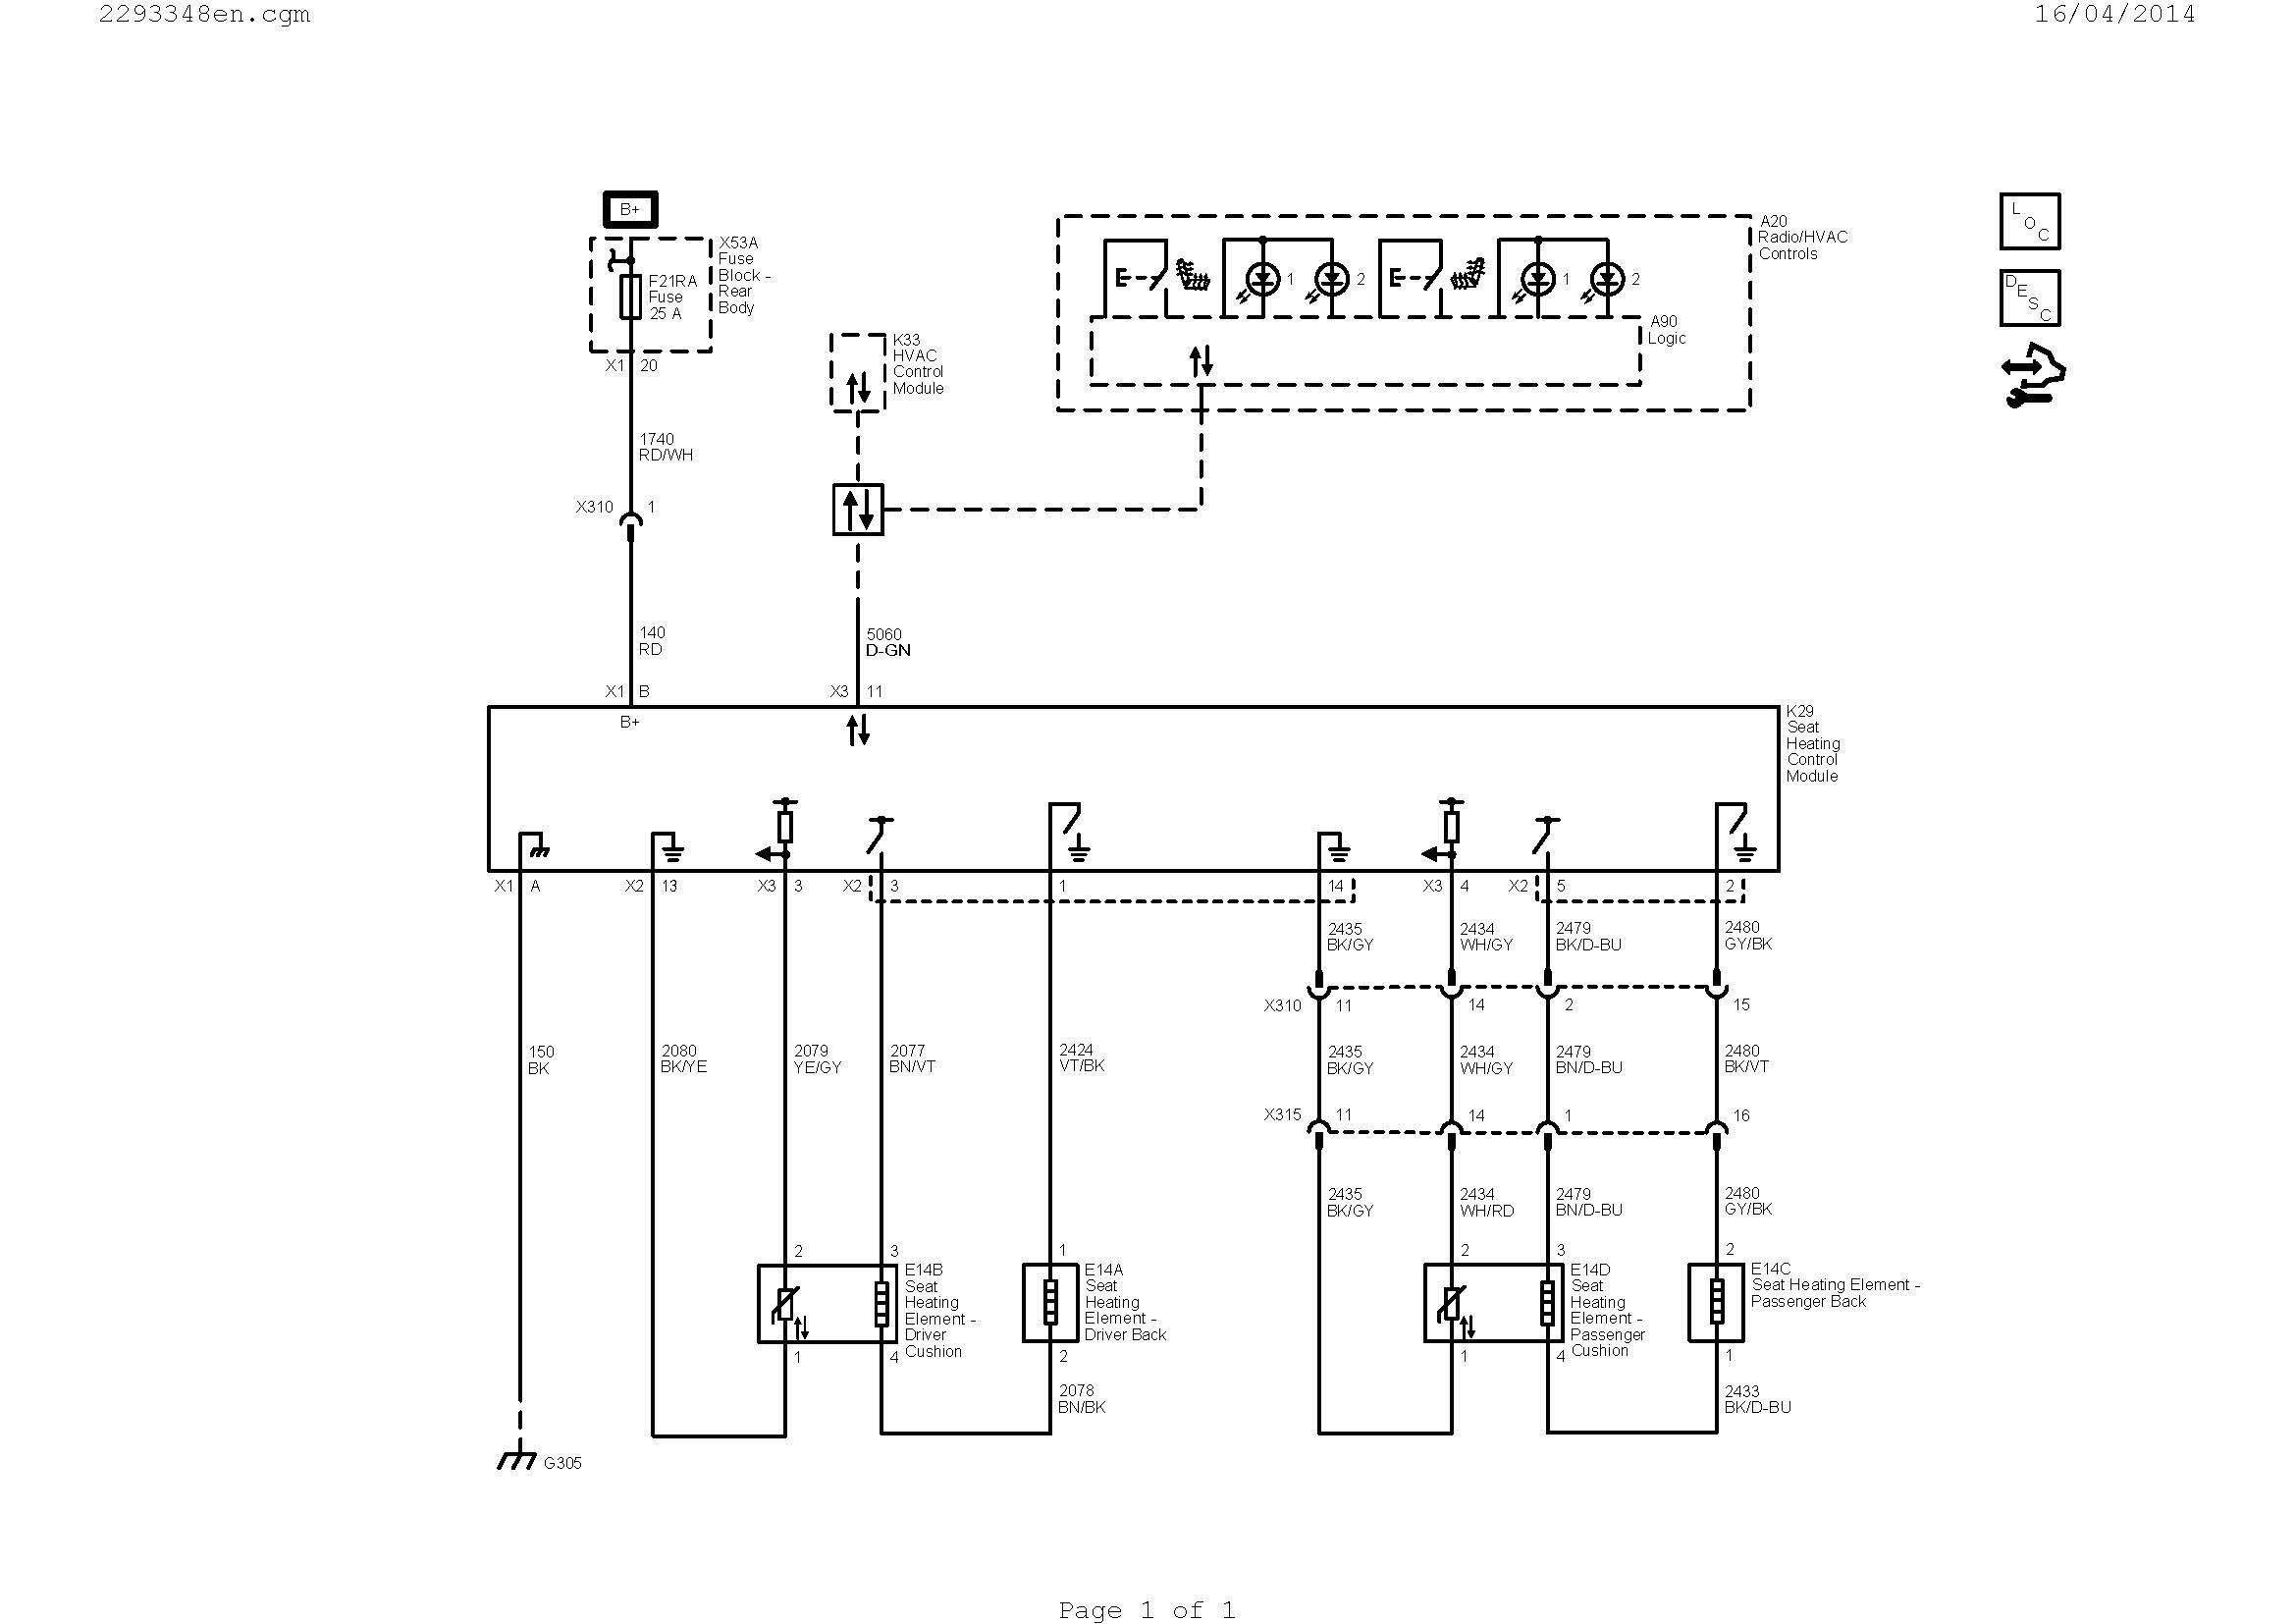 2015 Wrx Engine Diagram 2015 Honda Accord Stereo Wiring Diagram 2018 2014 Honda Accord Of 2015 Wrx Engine Diagram